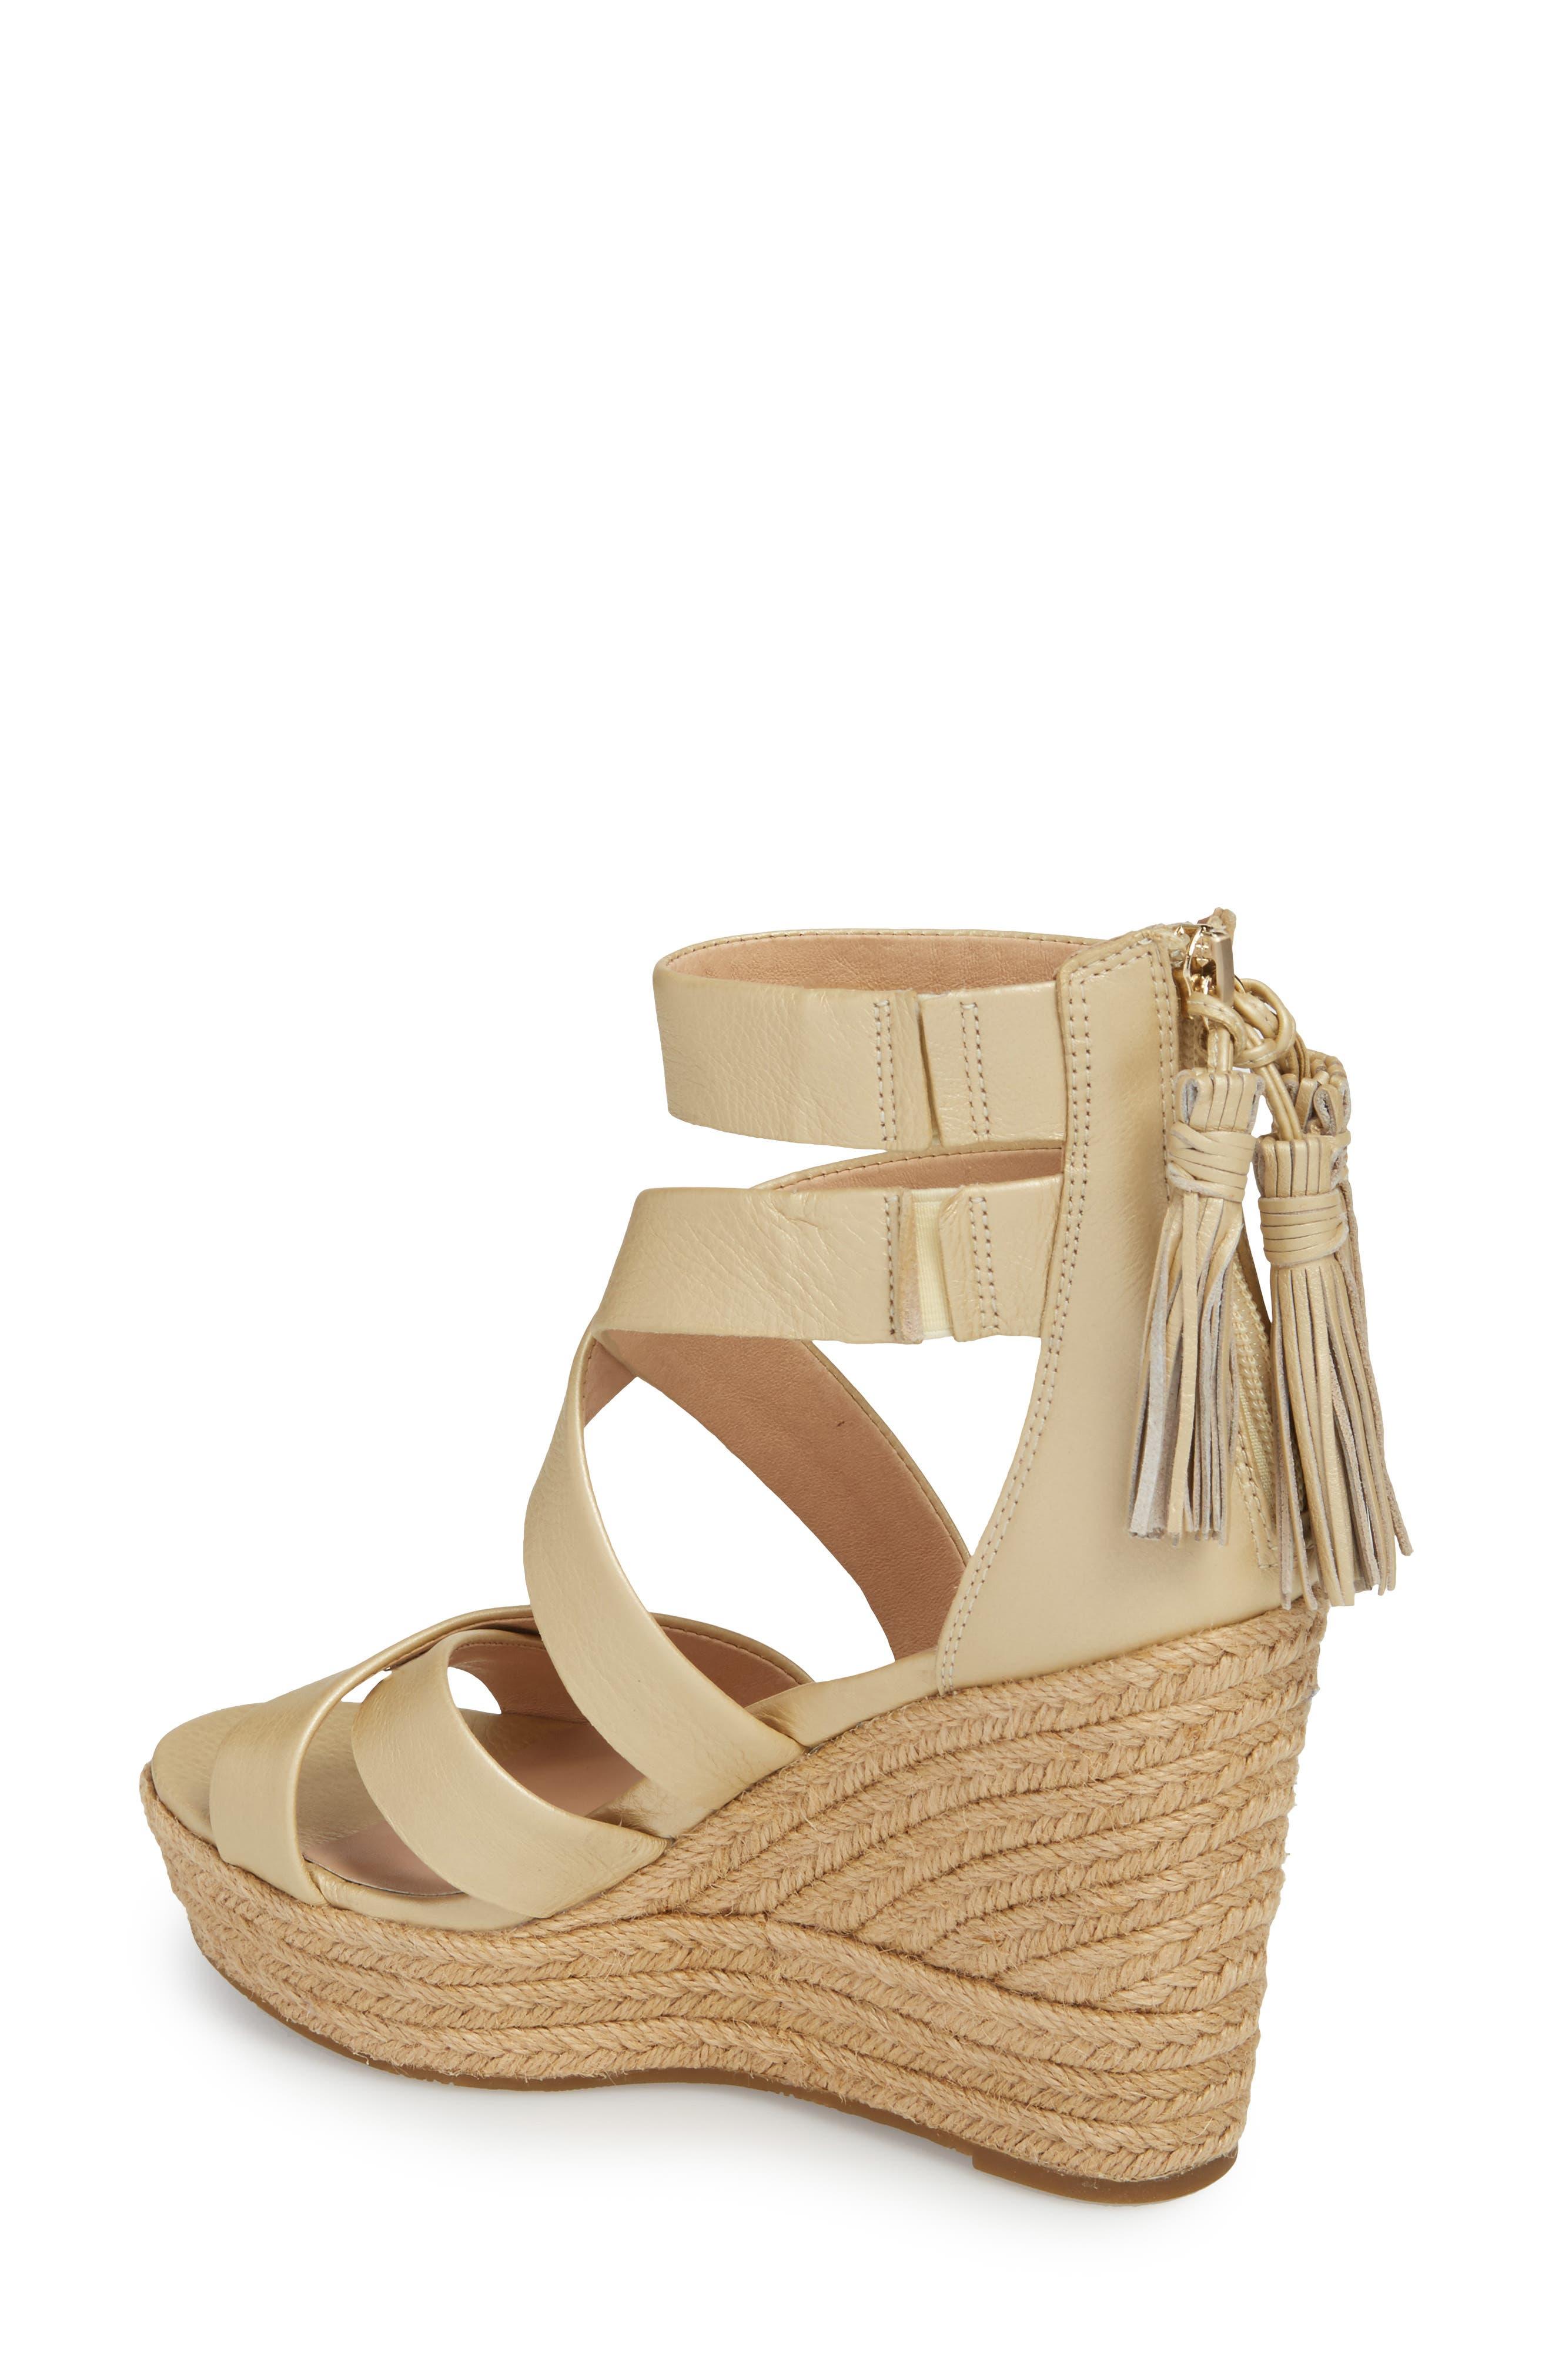 Raquel Platform Wedge Sandal,                             Alternate thumbnail 2, color,                             Soft Gold Leather